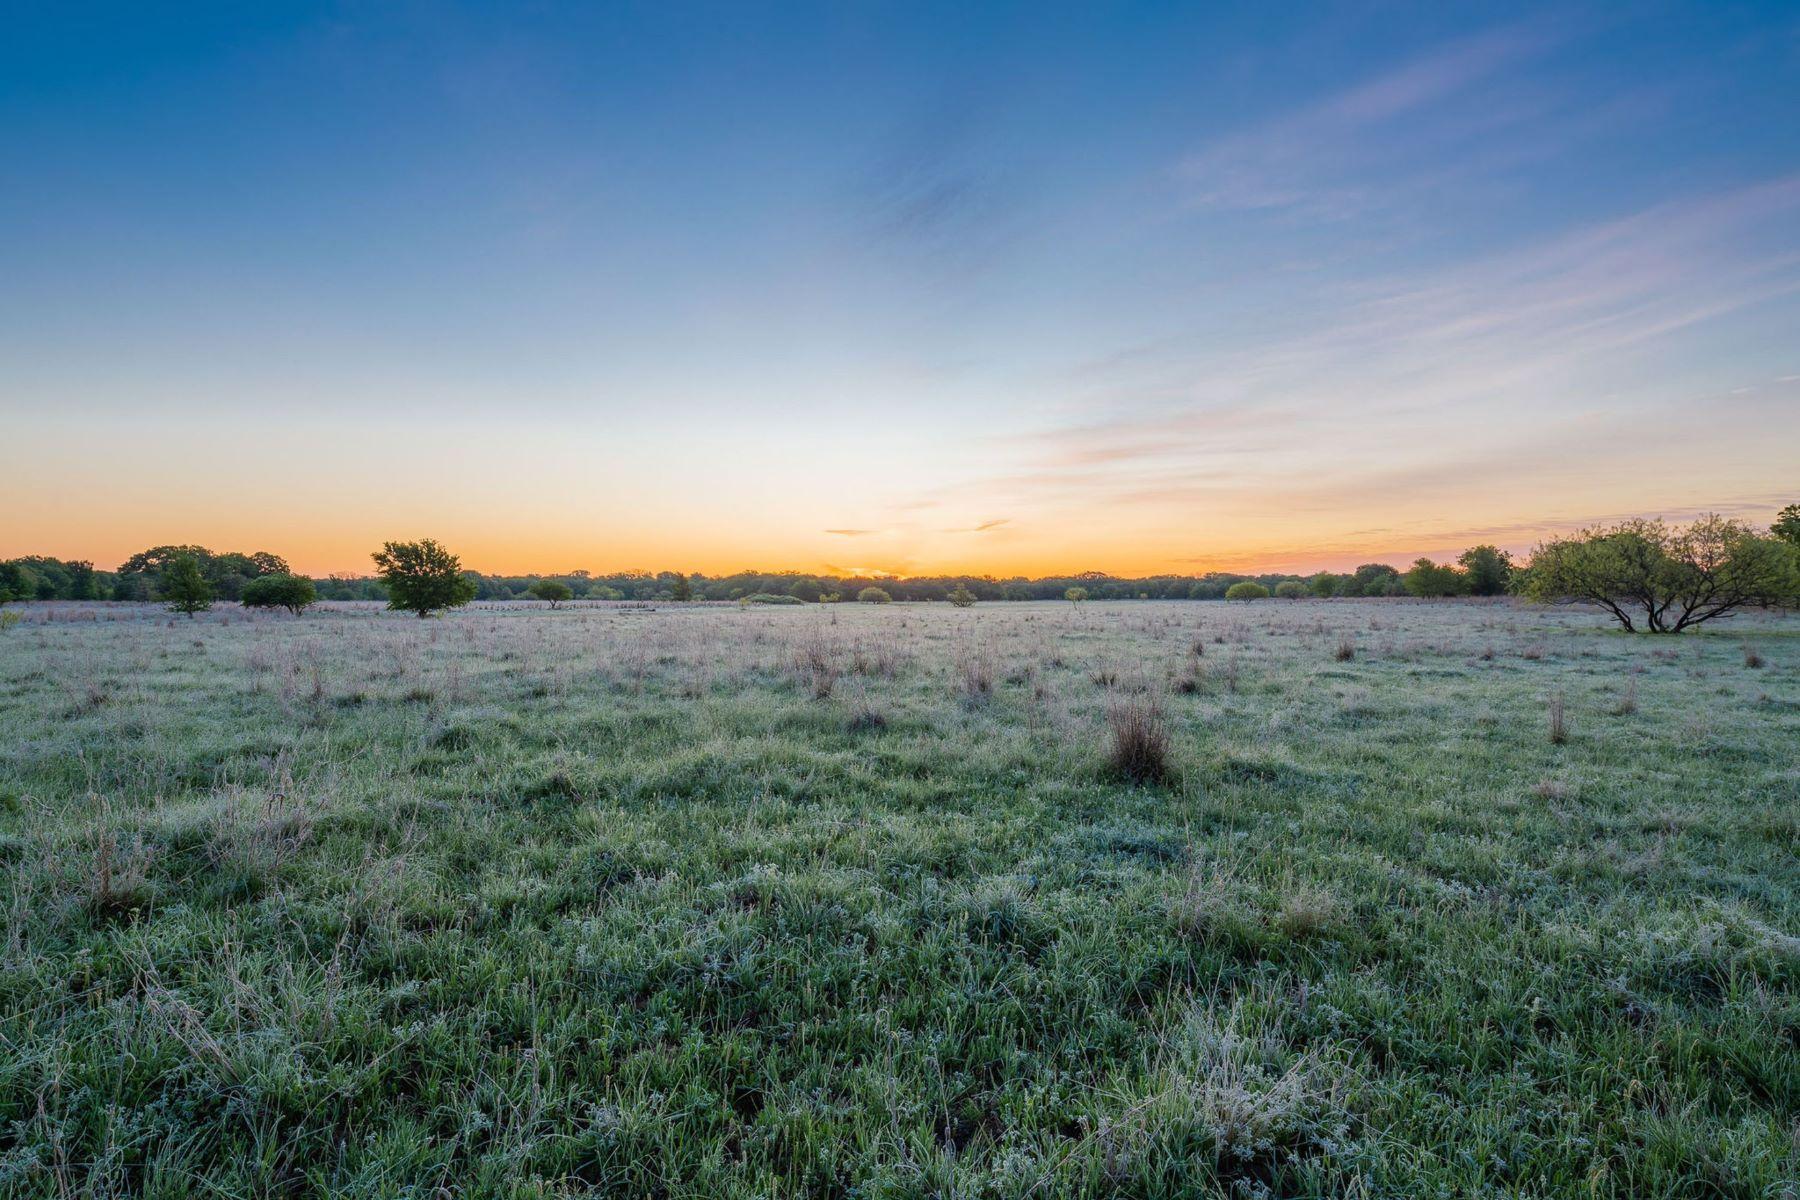 Farm / Ranch / Plantation for Sale at Little Wichita River Ranch 578 Bryant Edwards Road Henrietta, Texas 76365 United States